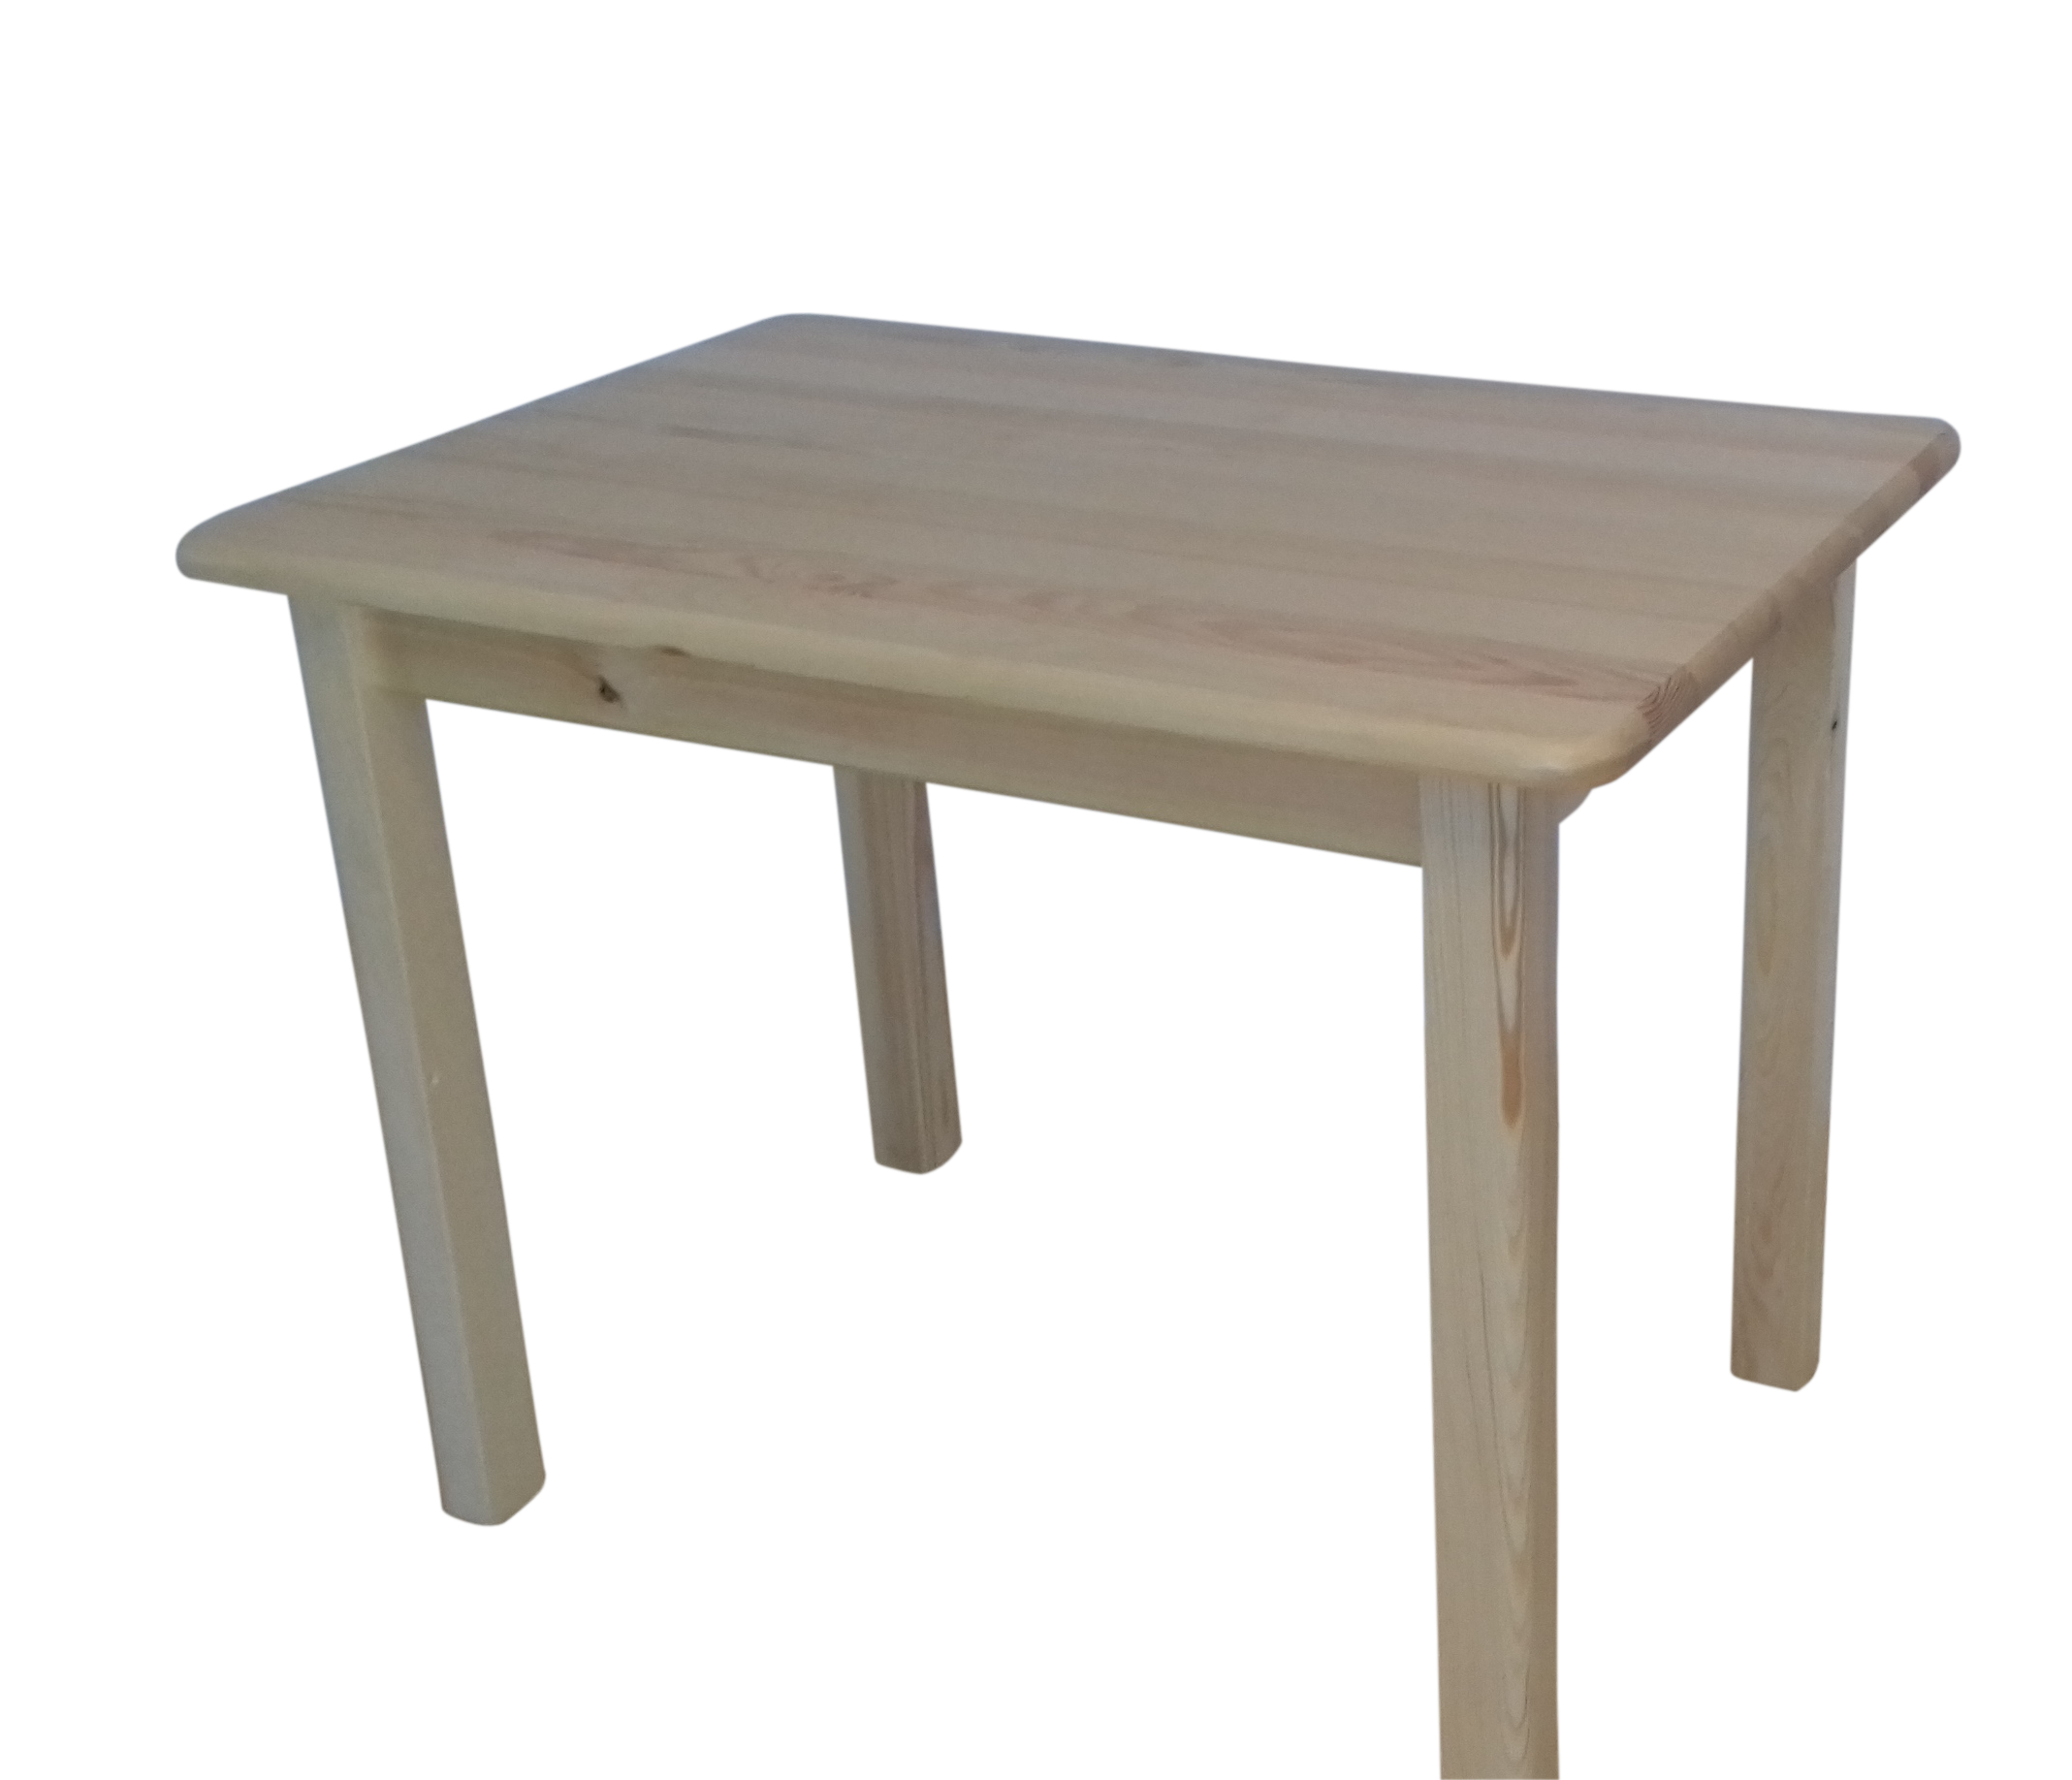 MASÍVNE kuchynský stôl 100x60 kuchyňa, jedáleň, bar